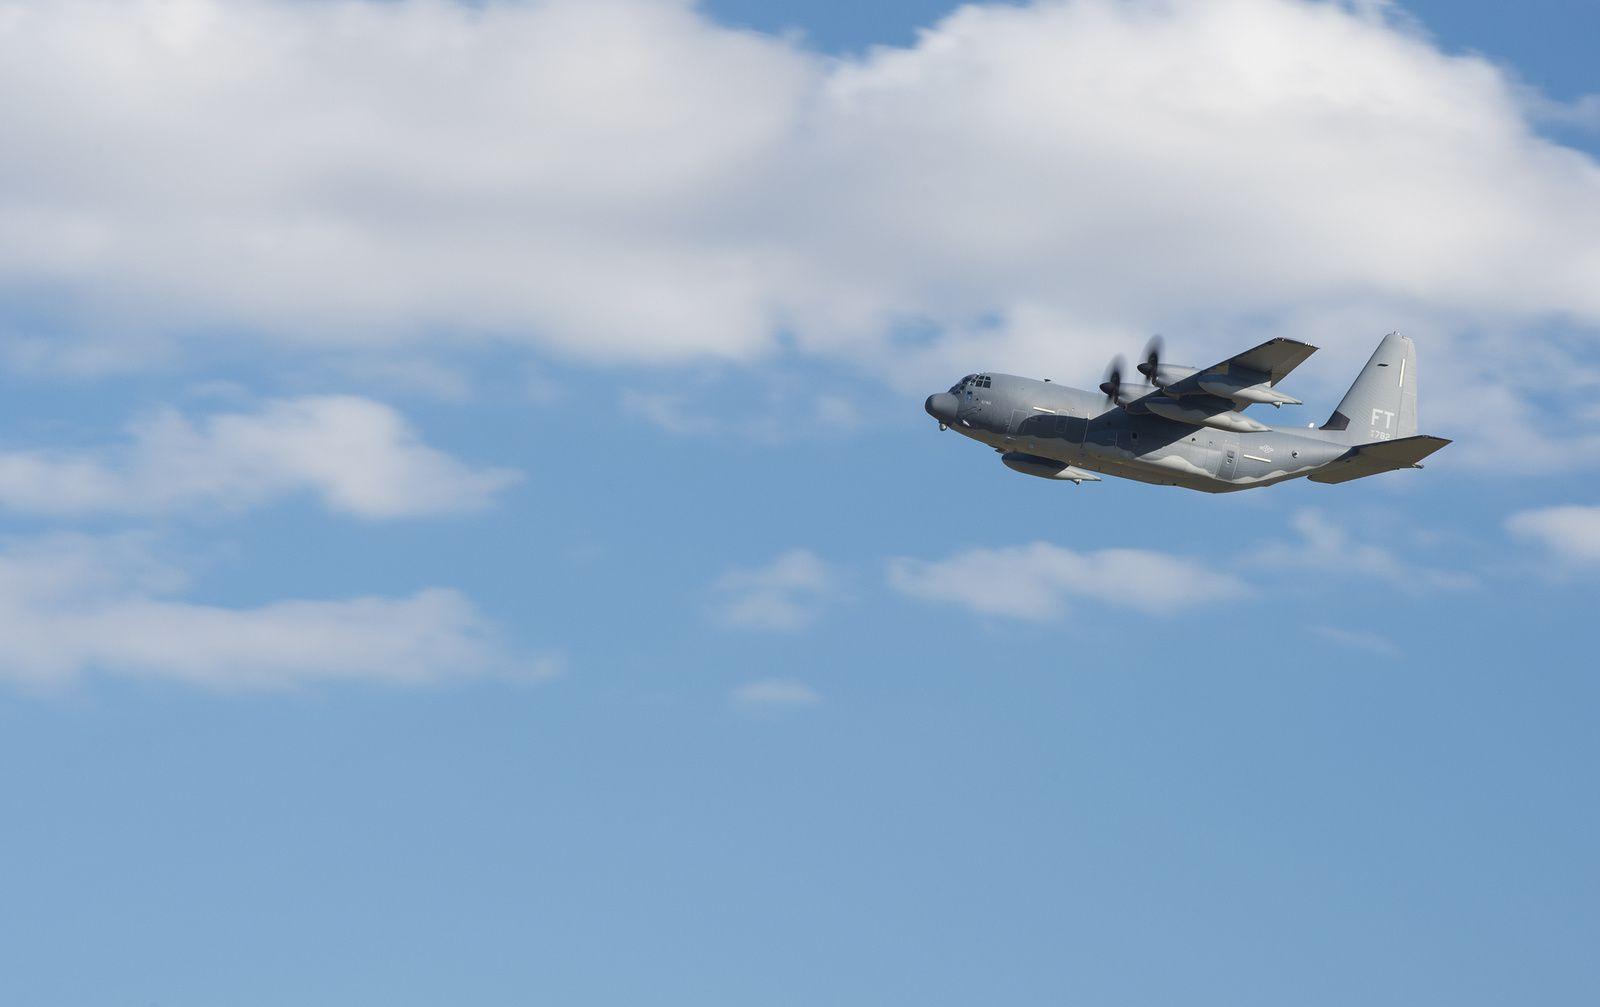 Lockheed Martin livre le 2 500ème C-130 Hercules